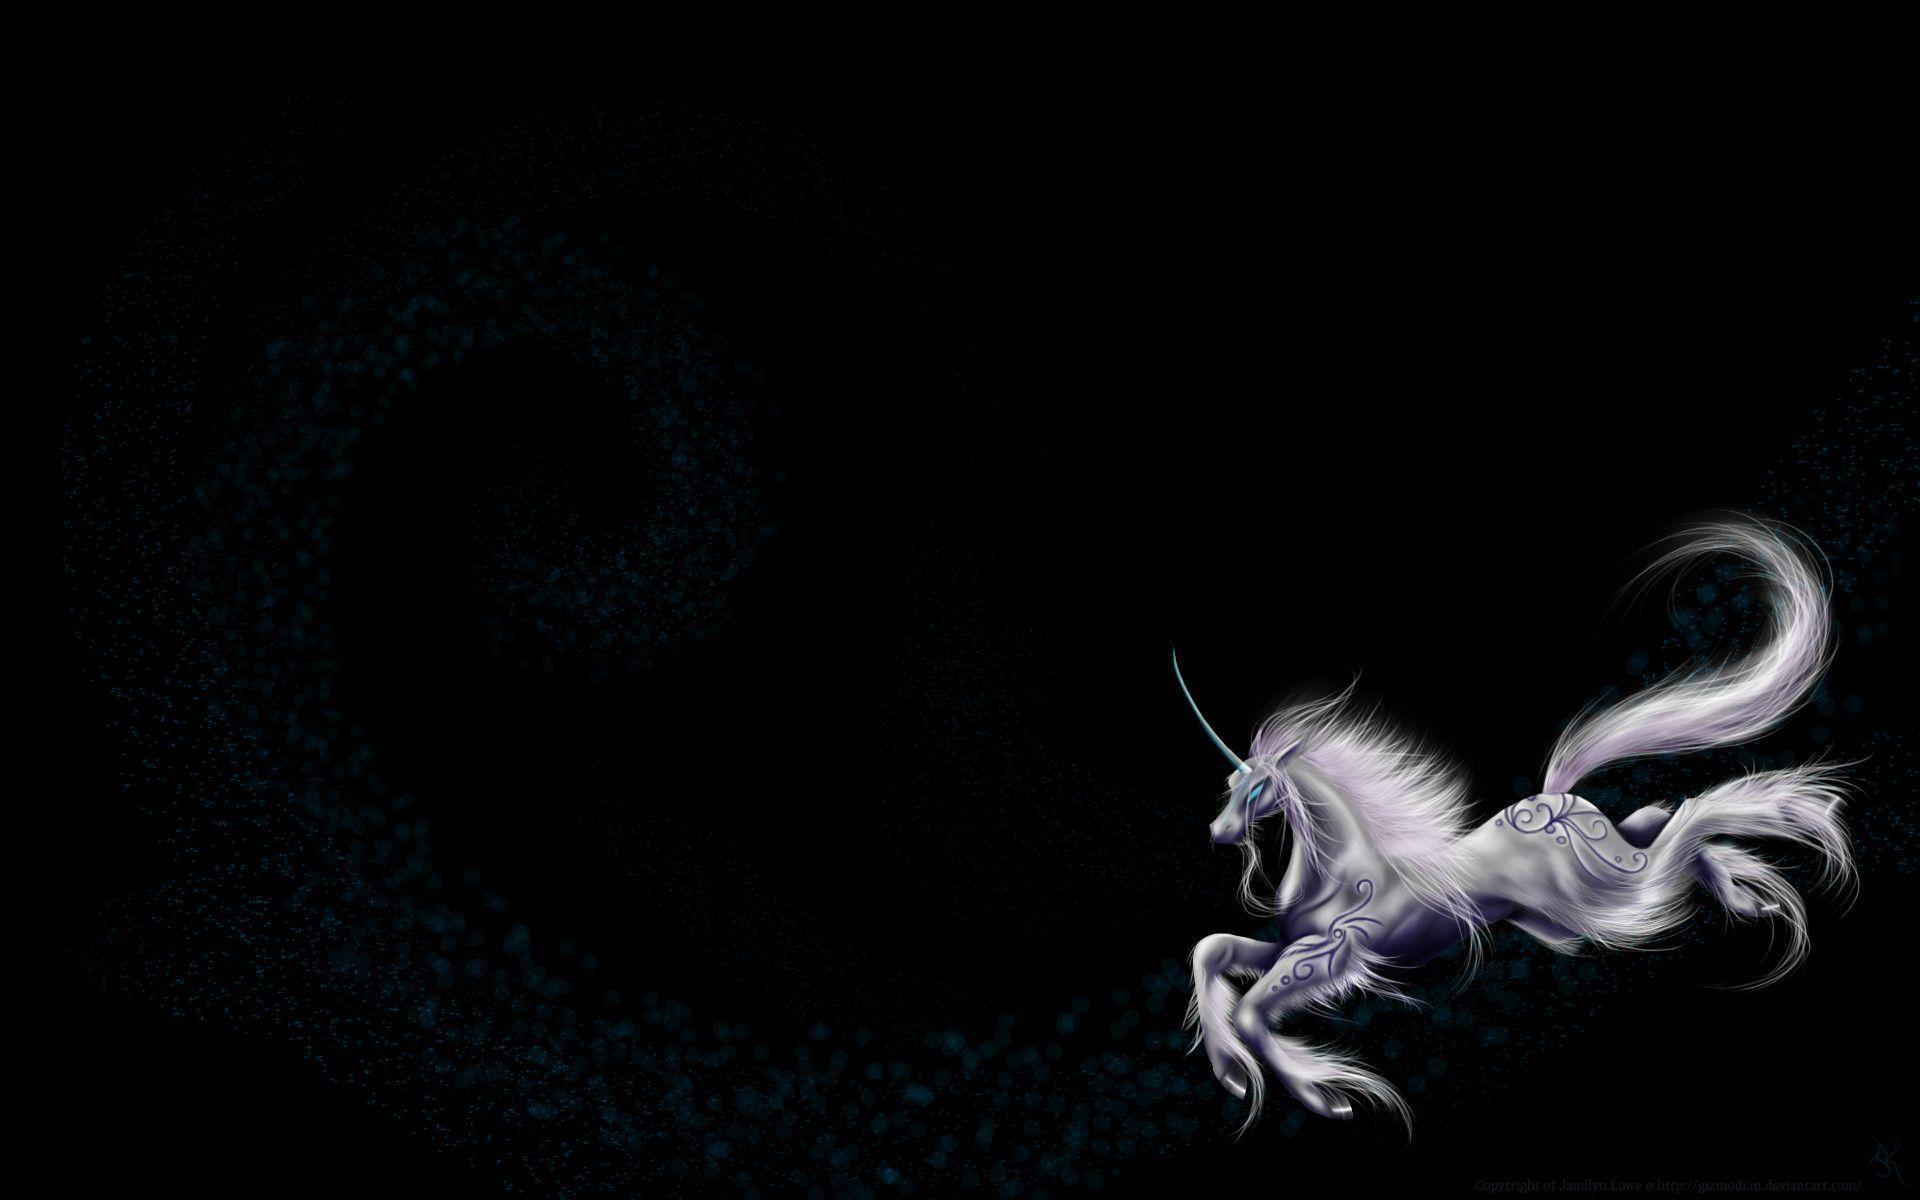 Black And White Unicorn Wallpaper Fantasy unicorn wallpapers ...